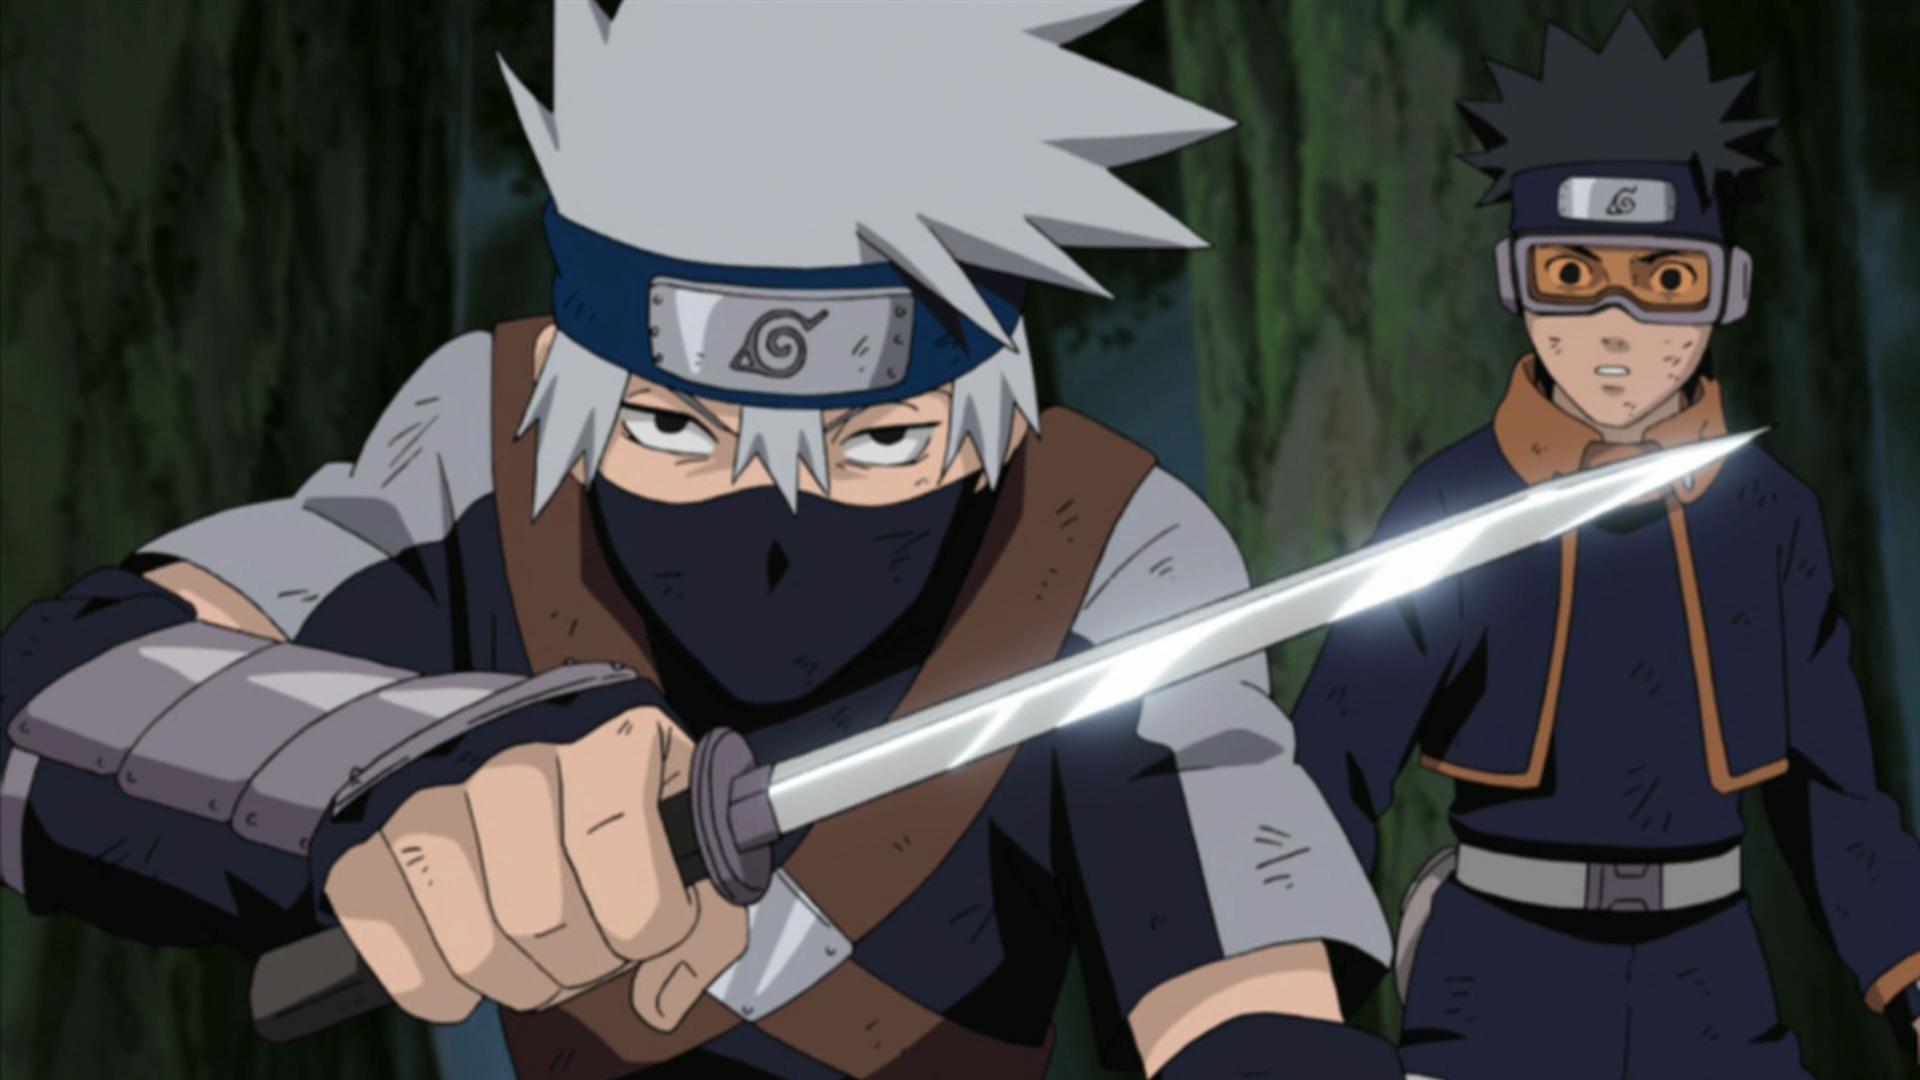 White Light Chakra Sabre | Narutopedia | FANDOM powered by Wikia